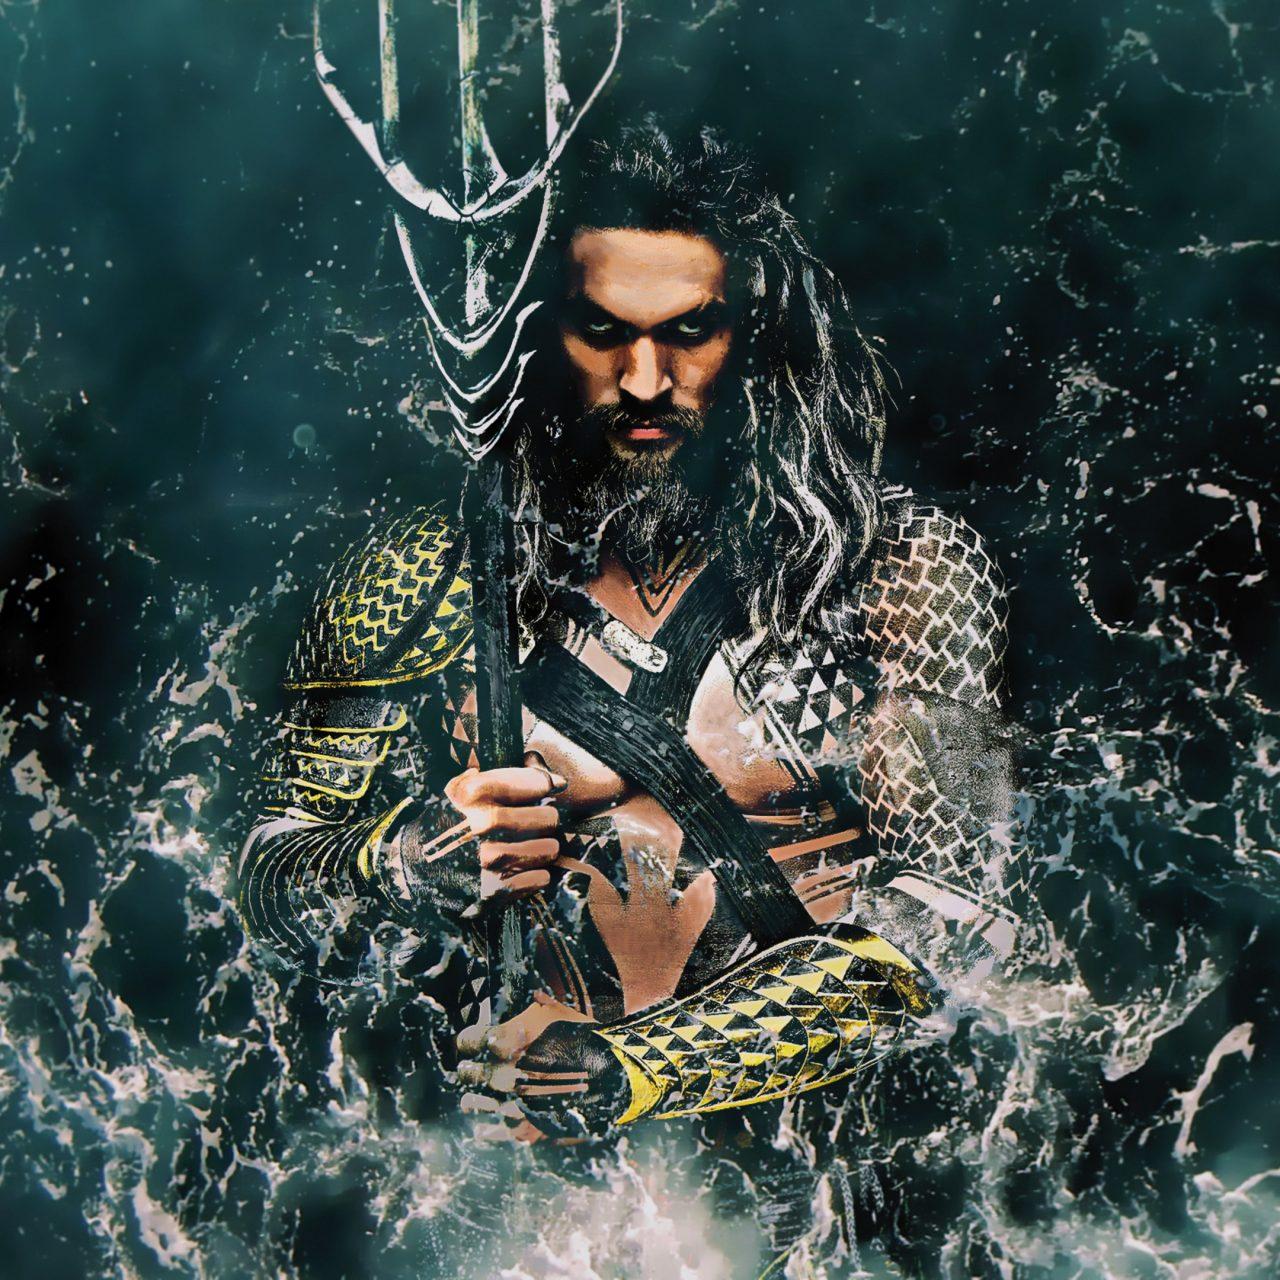 Why Jason Momoa Is The Best Aquaman: Aquaman Movie 2018 Jason Momoa 4K Wallpaper